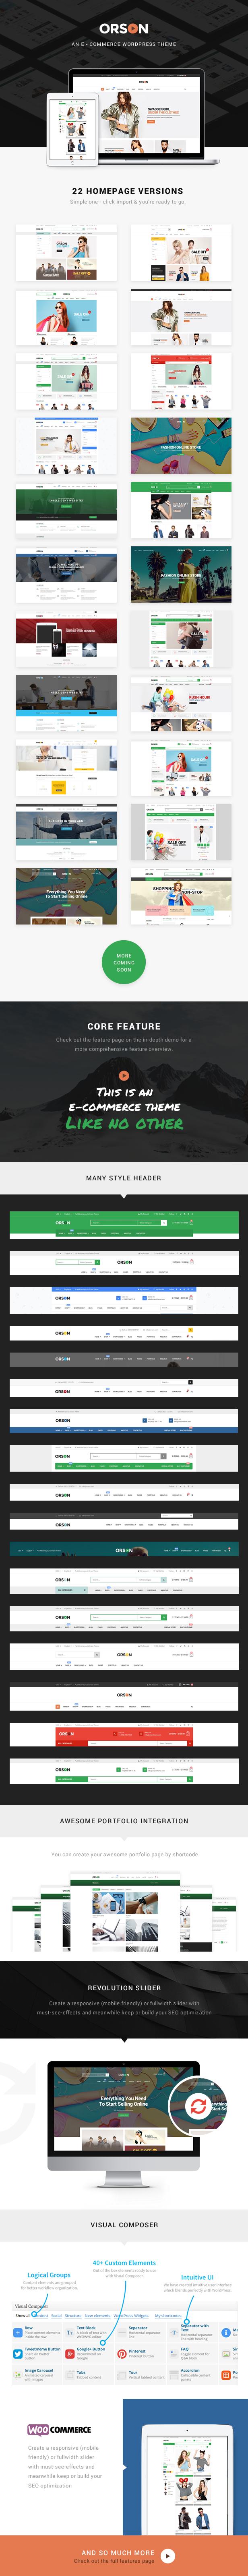 Orson - WordPress Theme for Online Stores - 11